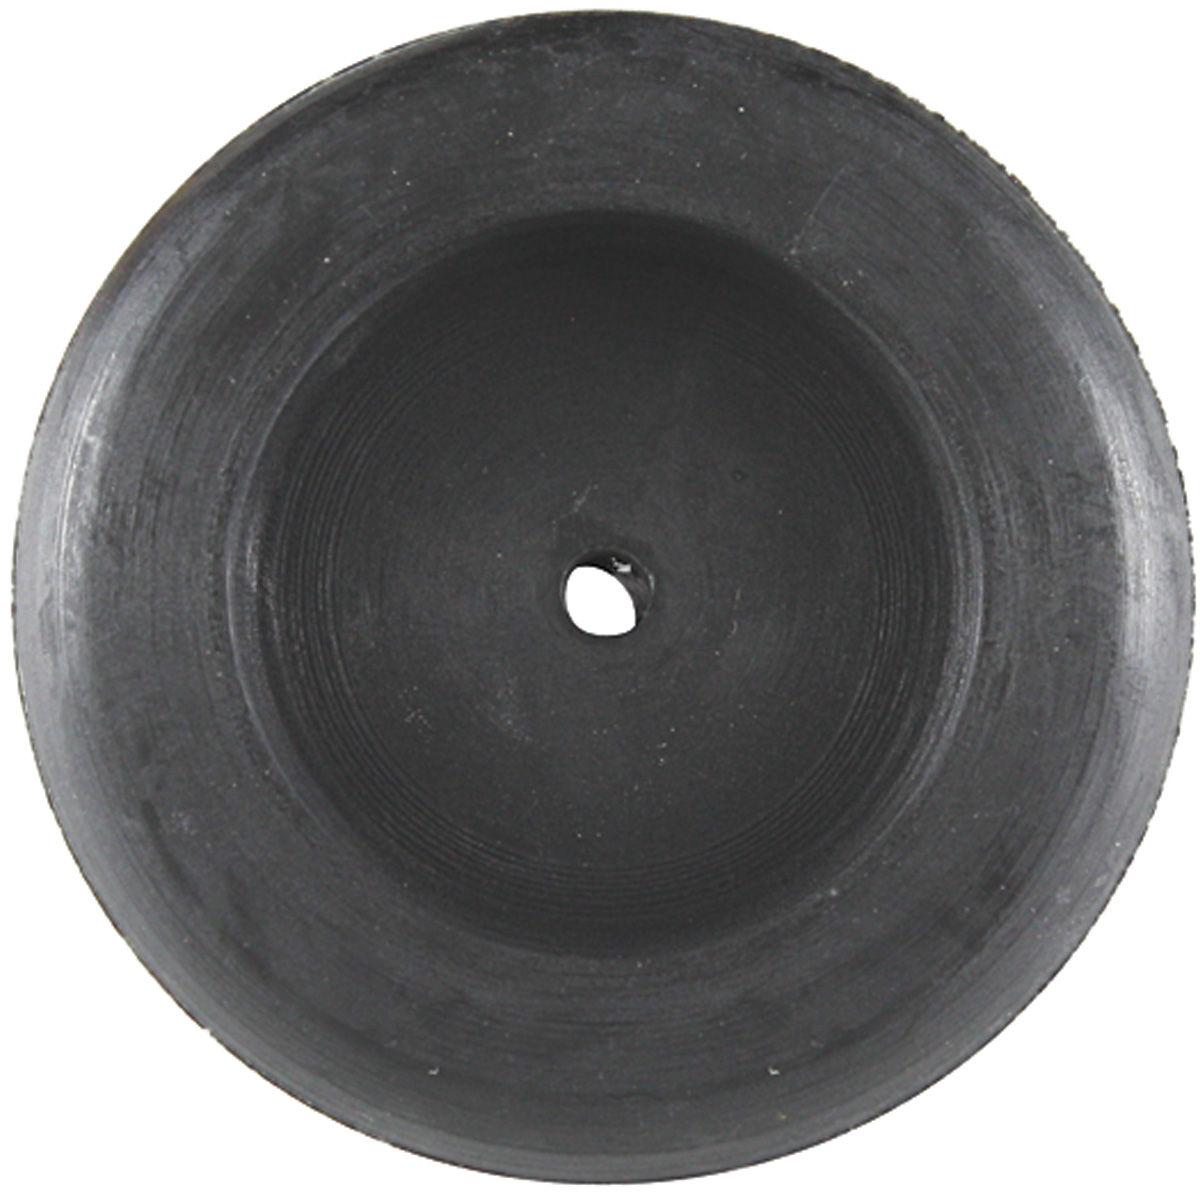 Grommet, Firewall, 1968-72 GM, 1 Hole